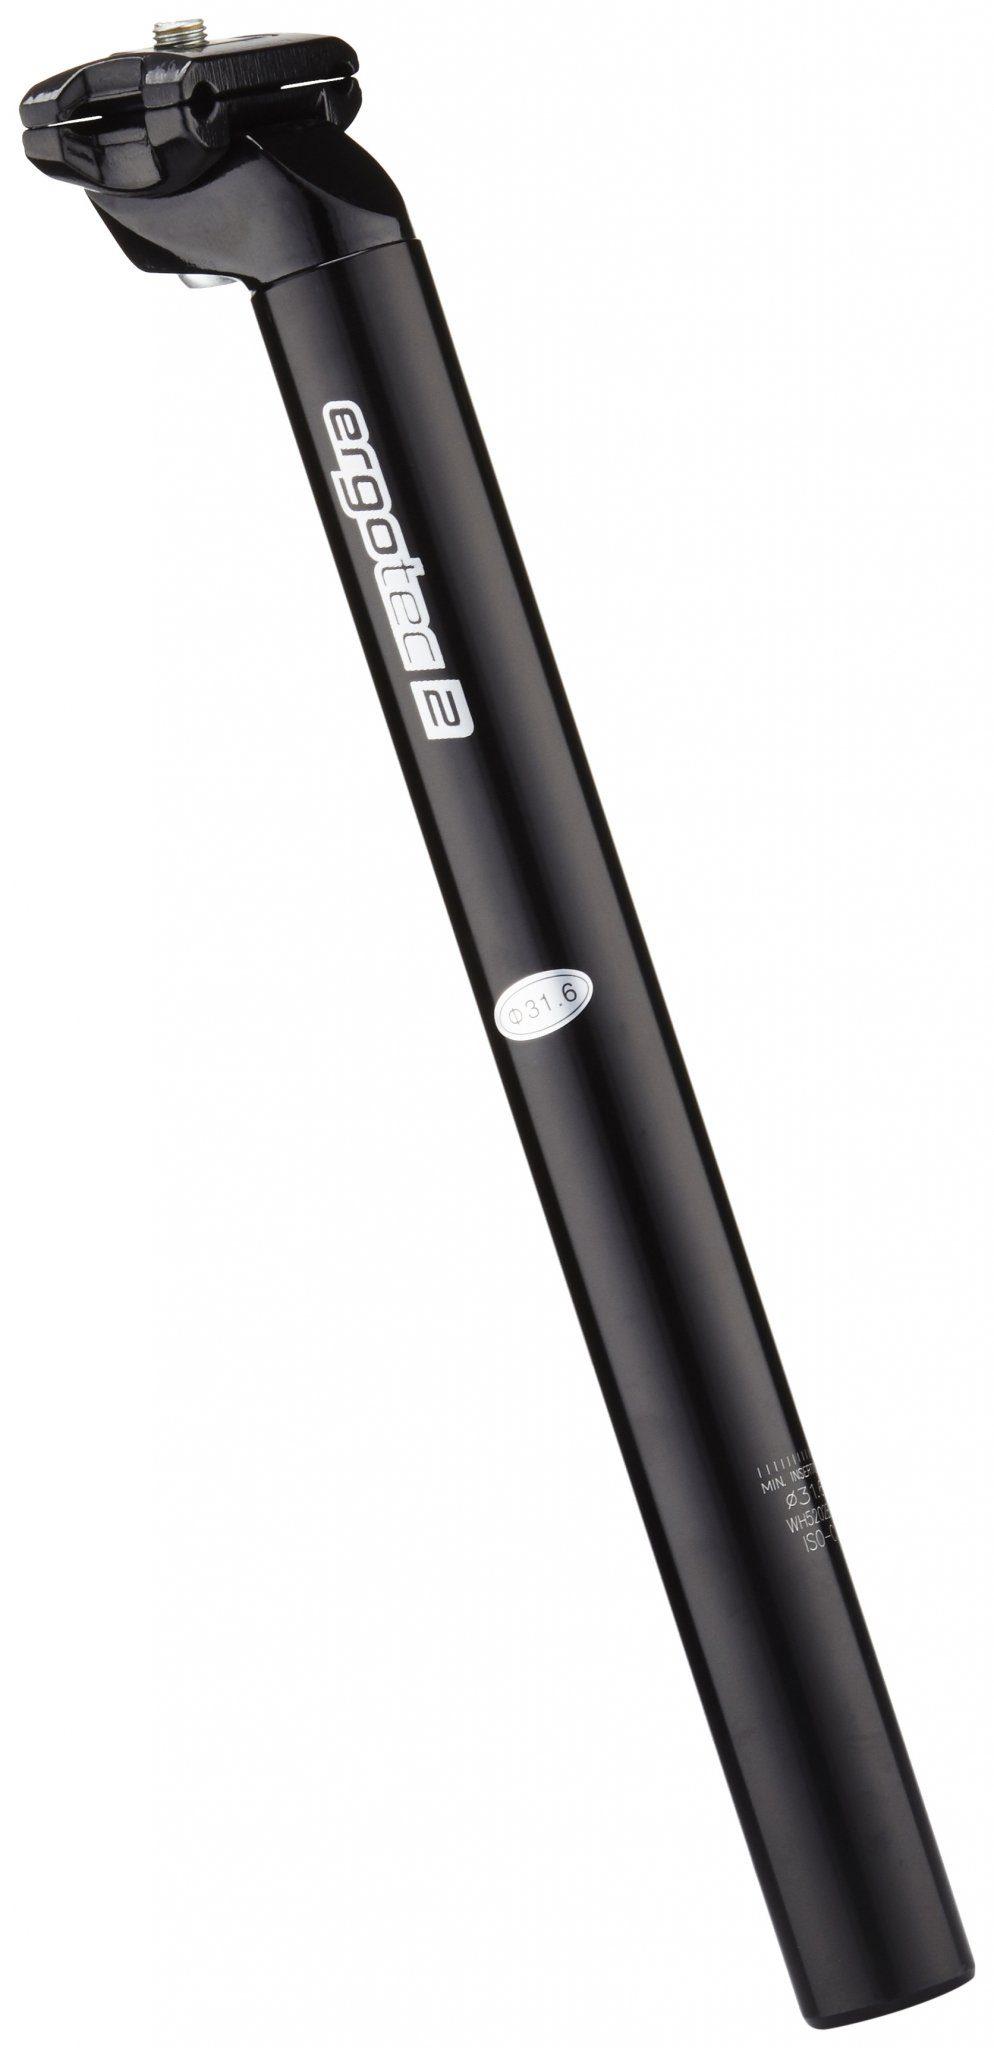 Humpert Sattelstütze »Patentsattelstütze Alu Ø 31,6 mm«